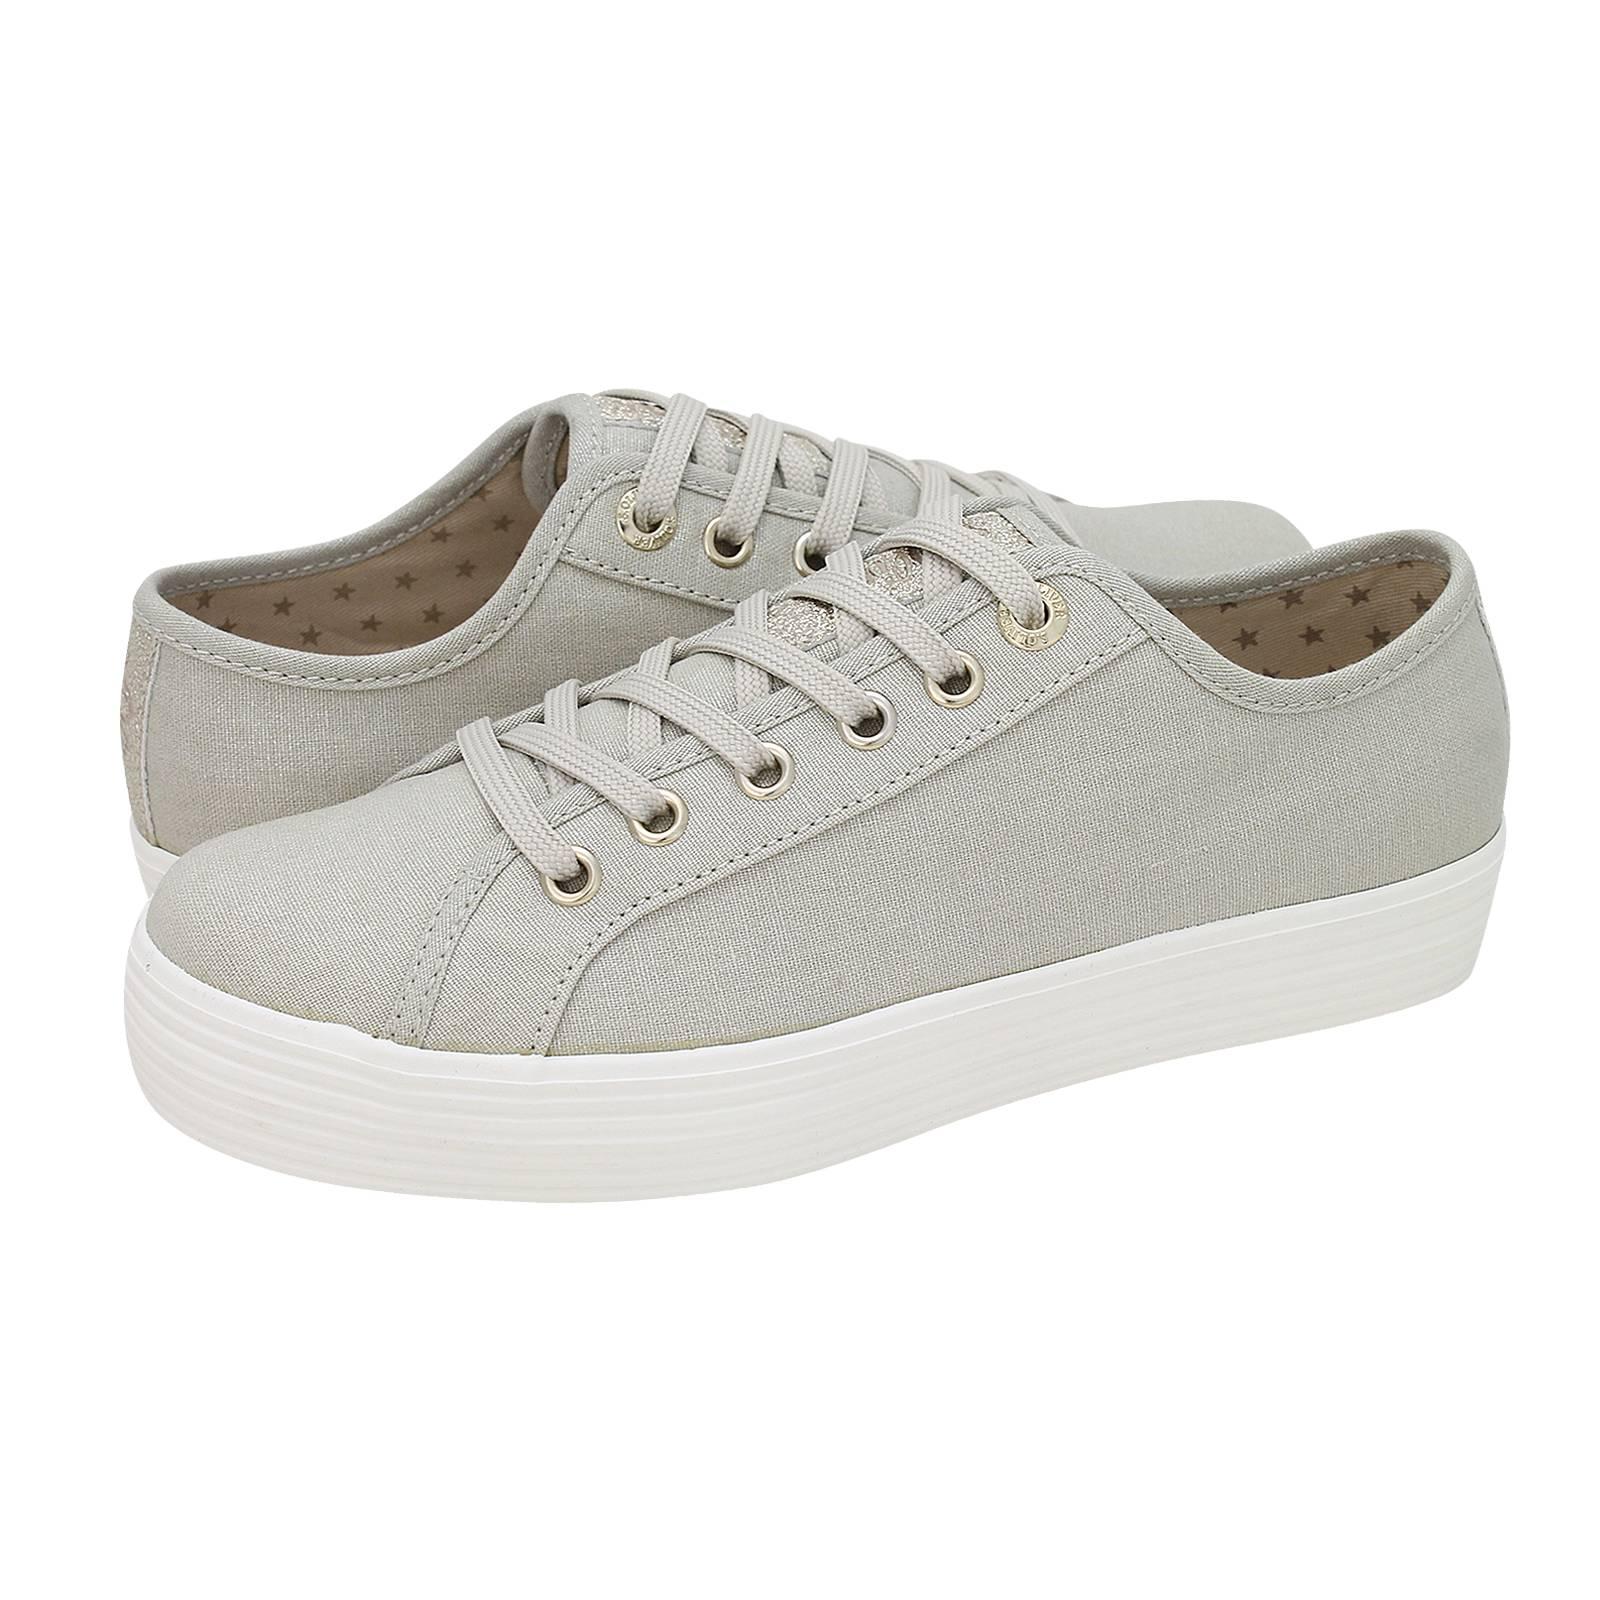 1f1ad3ceaab Παπούτσια casual s.Oliver Cerano